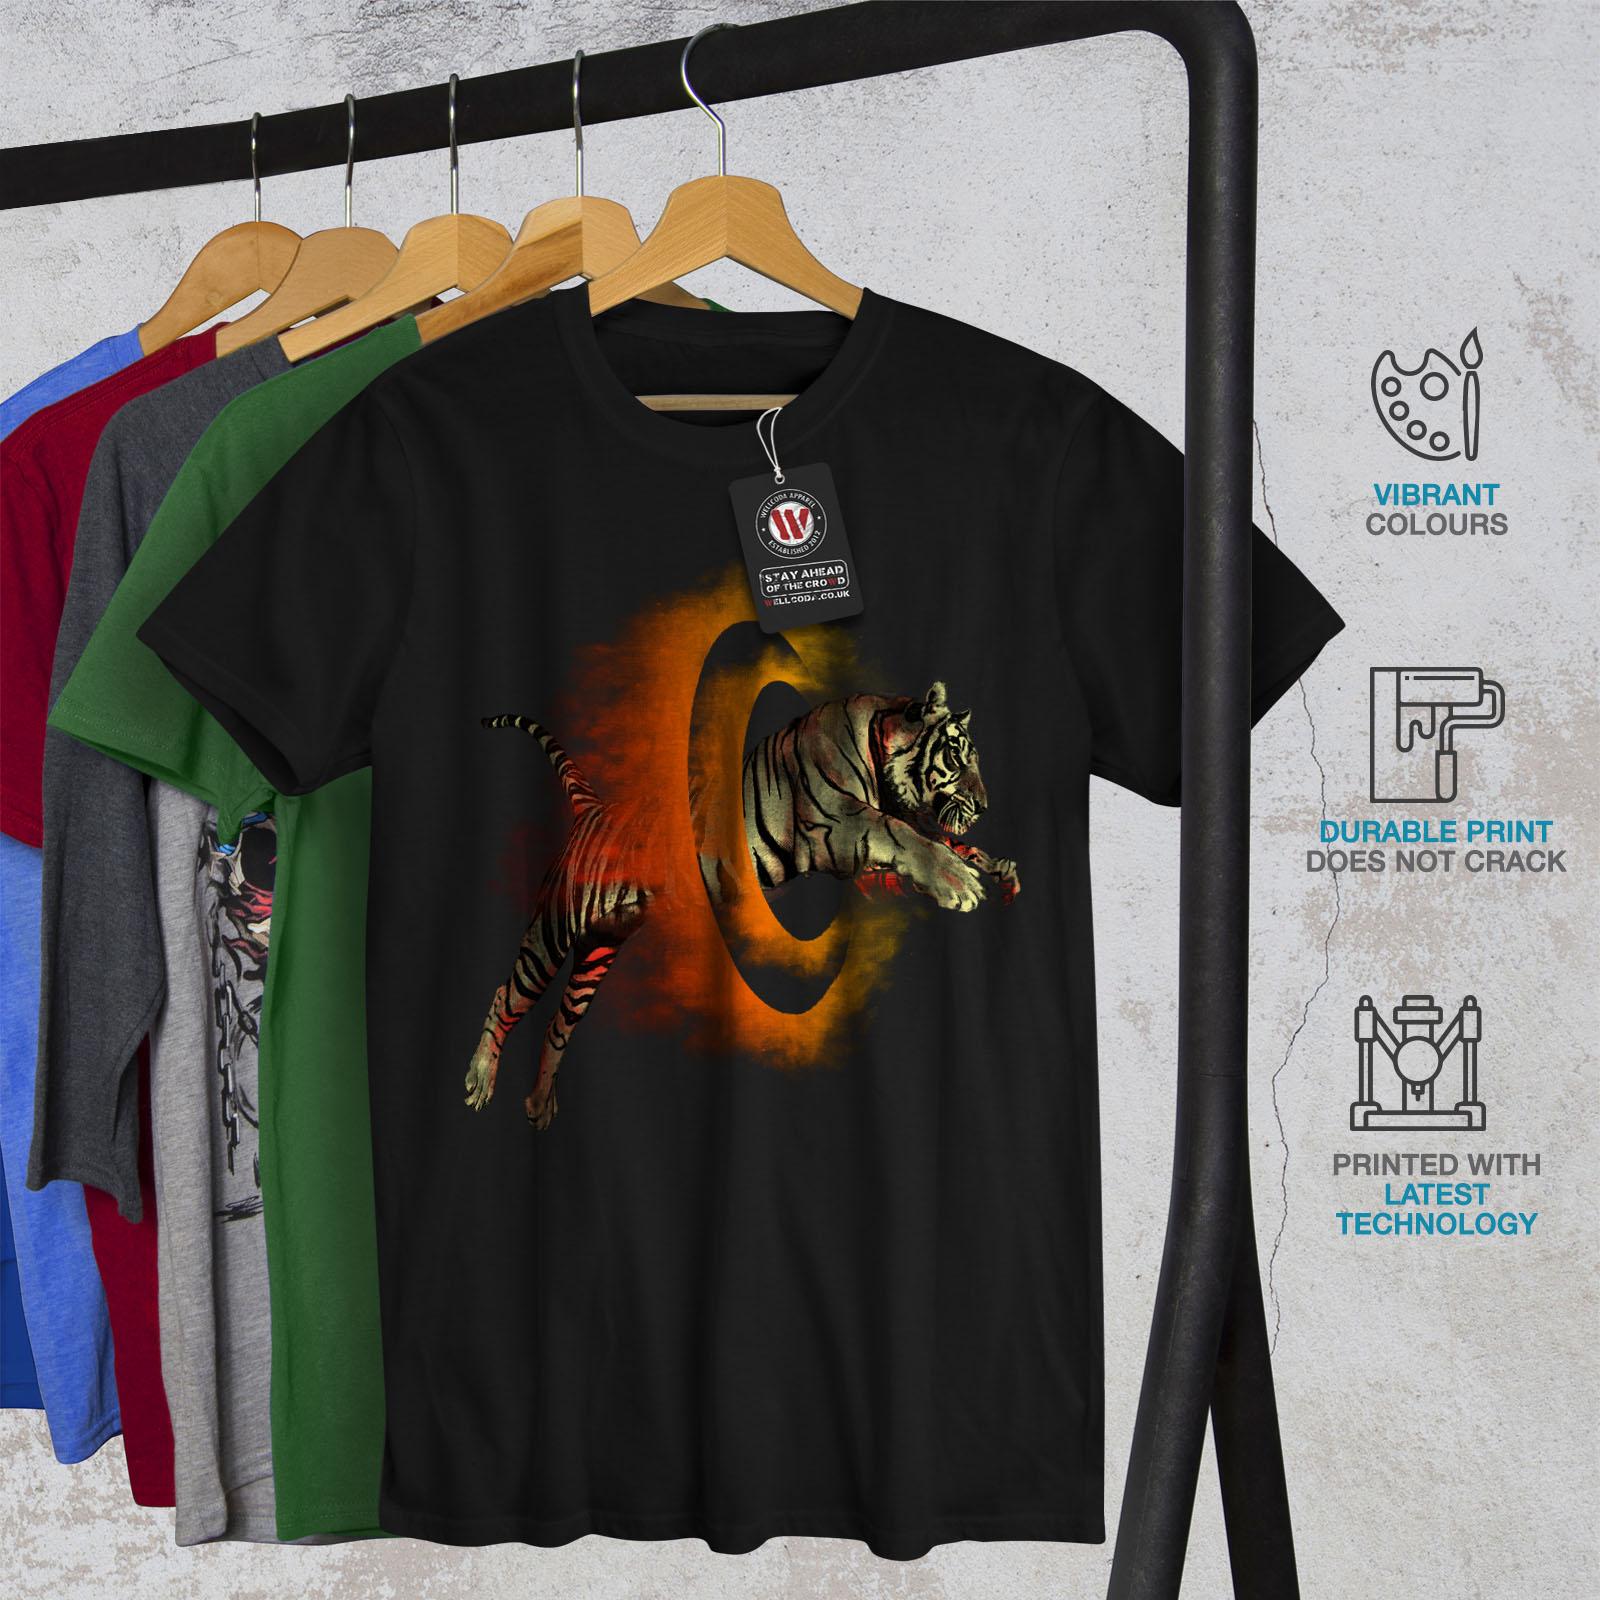 Wellcoda-Tiger-Portal-Cool-Mens-T-shirt-Flame-Graphic-Design-Printed-Tee thumbnail 6